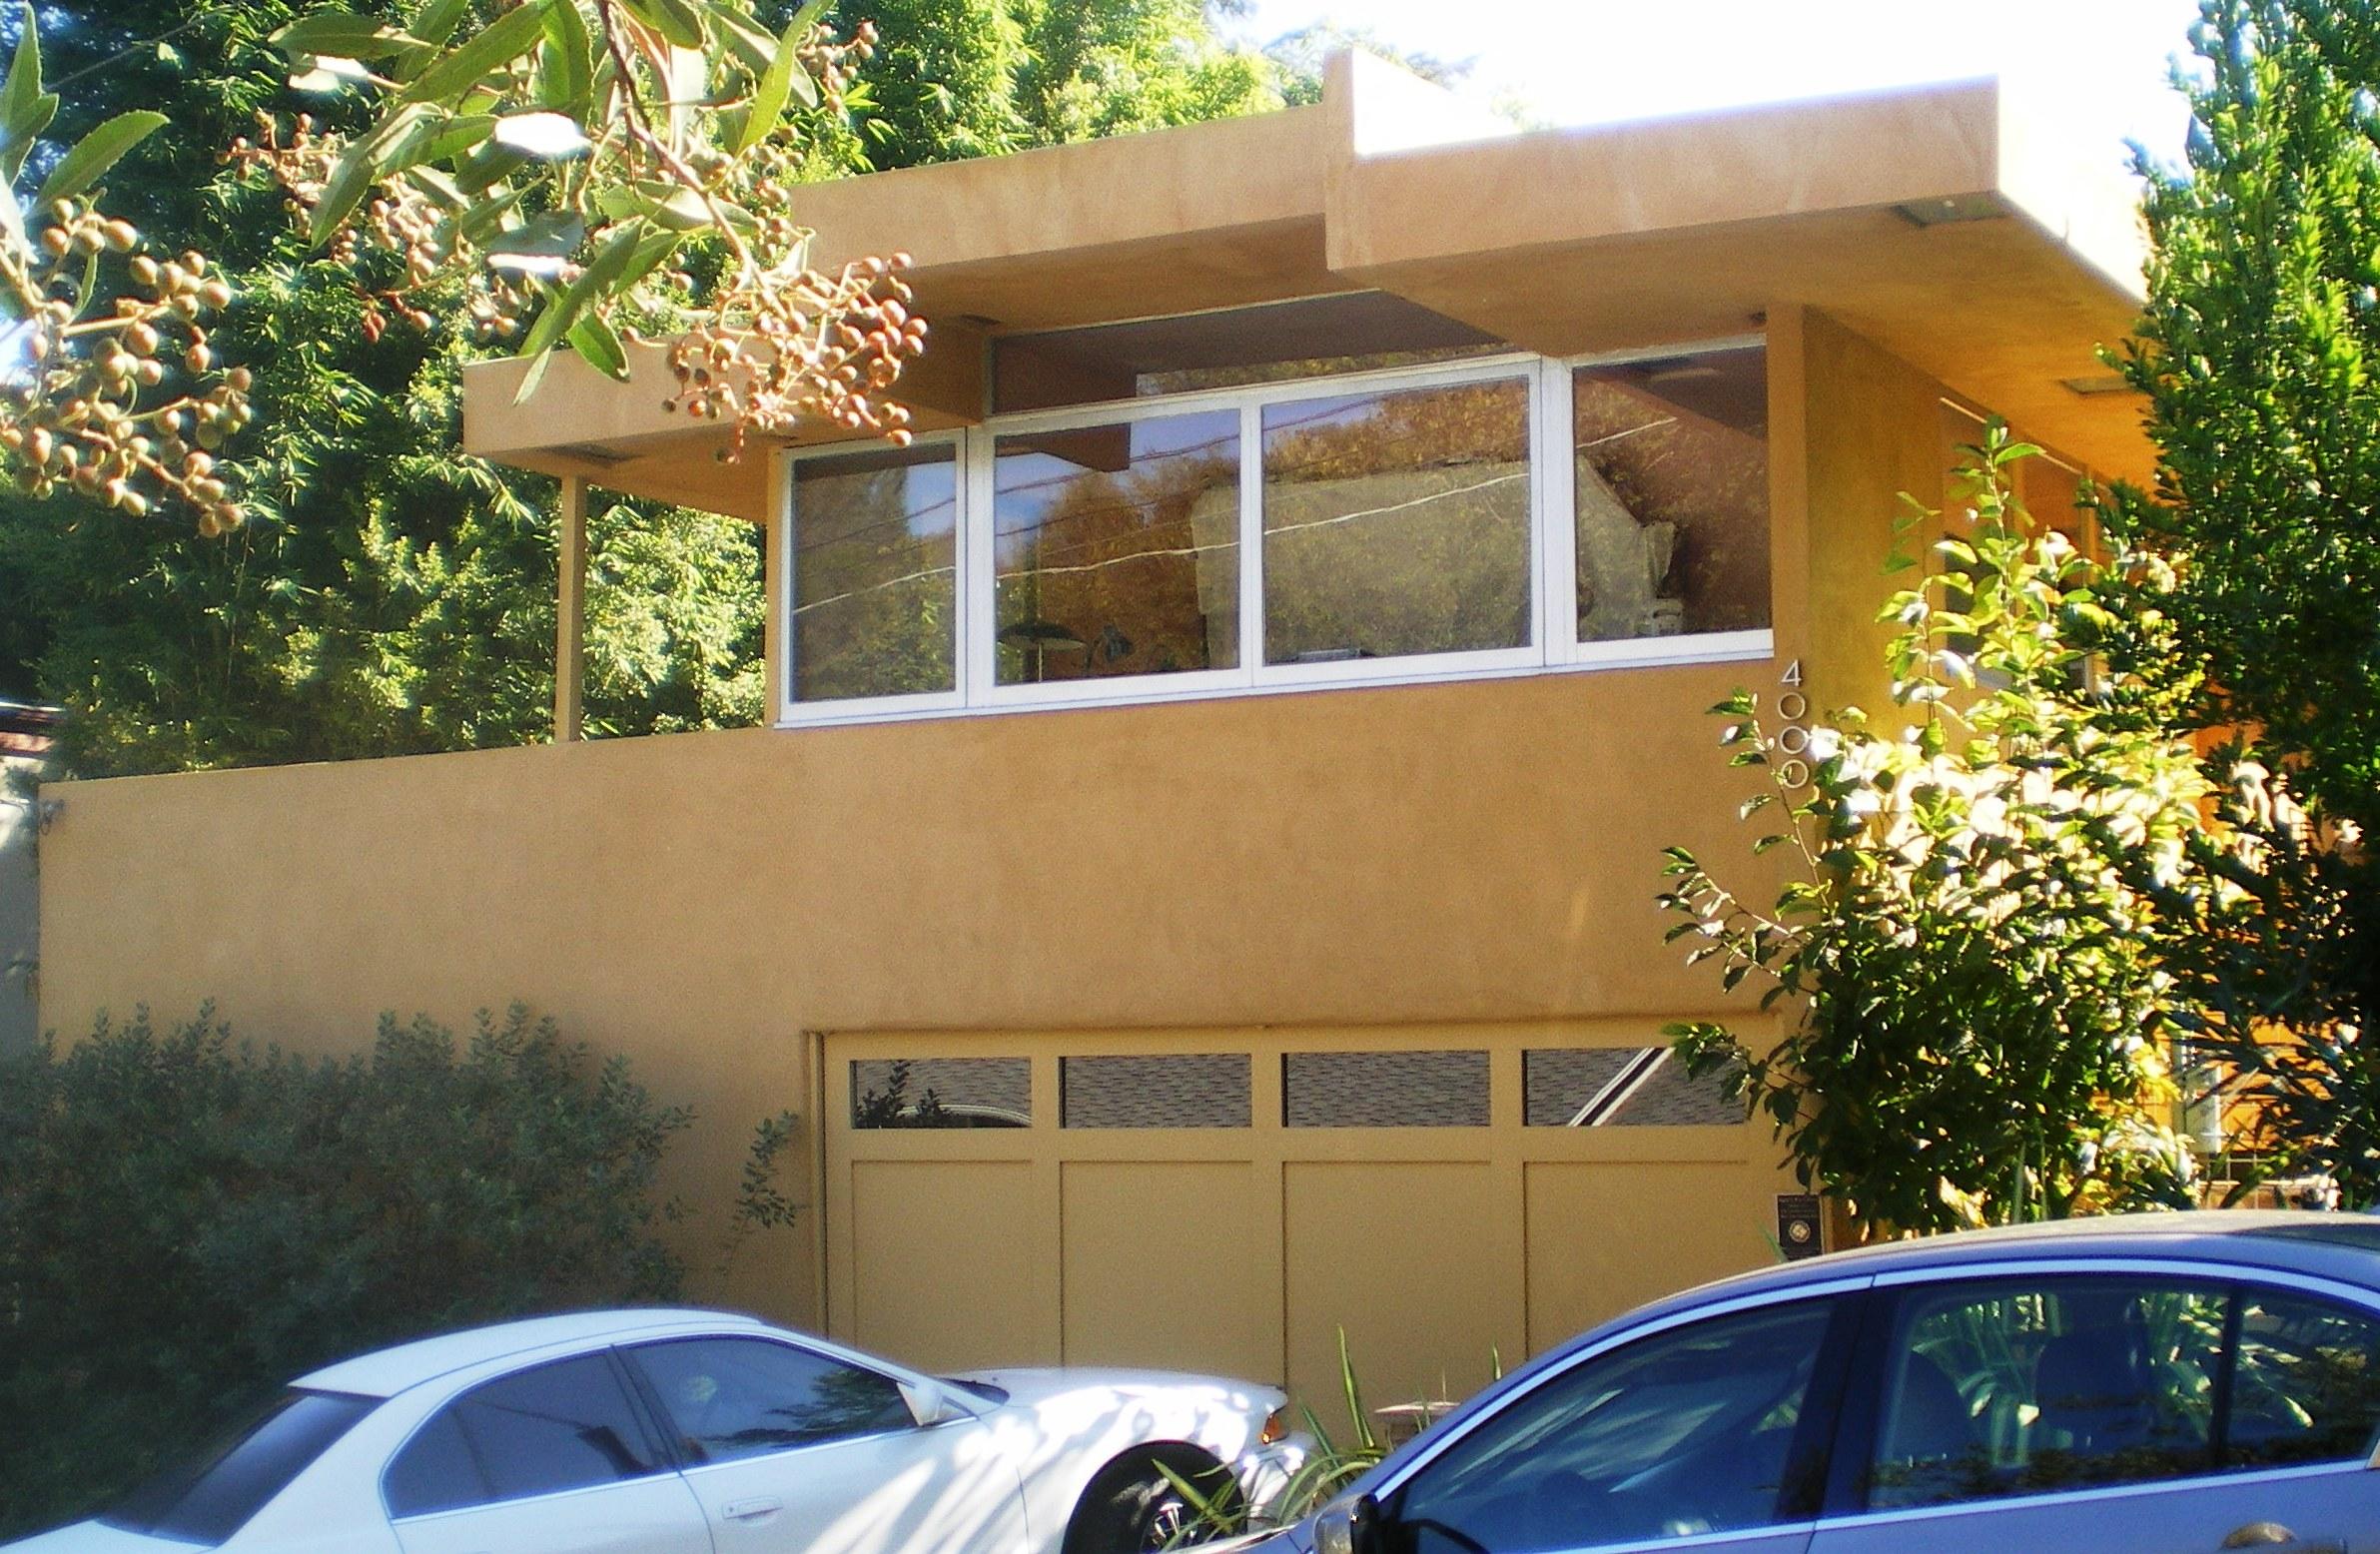 Sherman Oaks Apartments For Sale